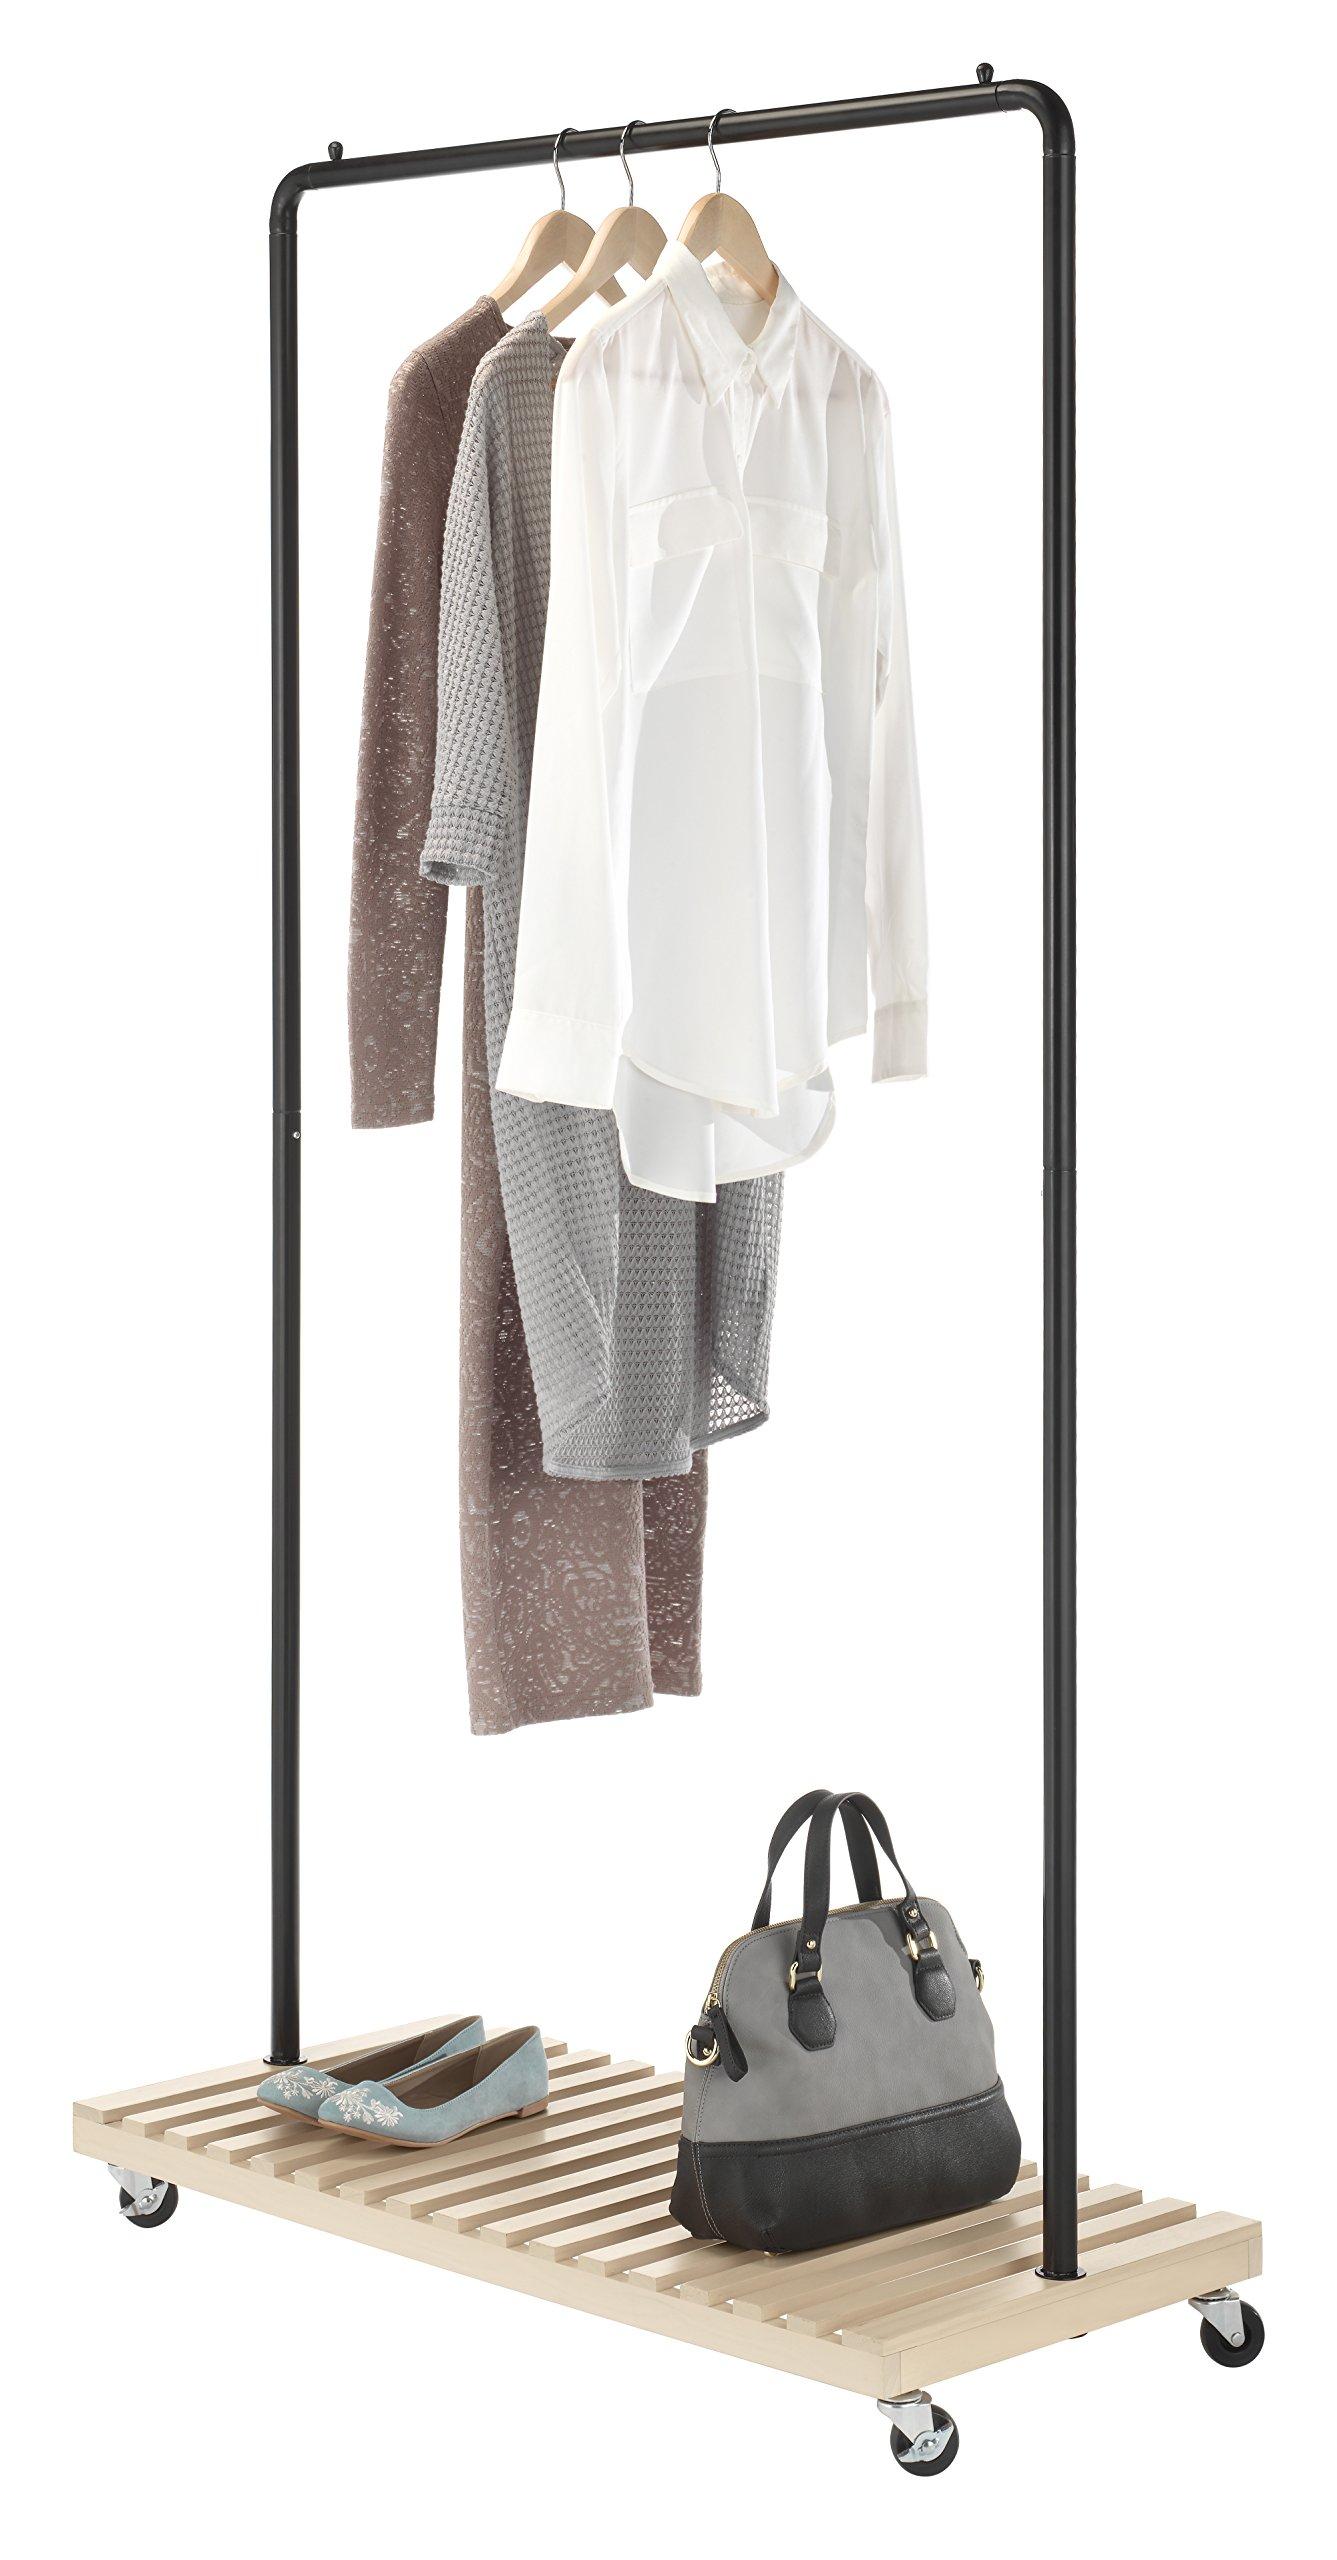 Whitmor Slat Wood Garment Rack - Freestanding Rolling Clothing Organizer - New Zealand Pine Shelf